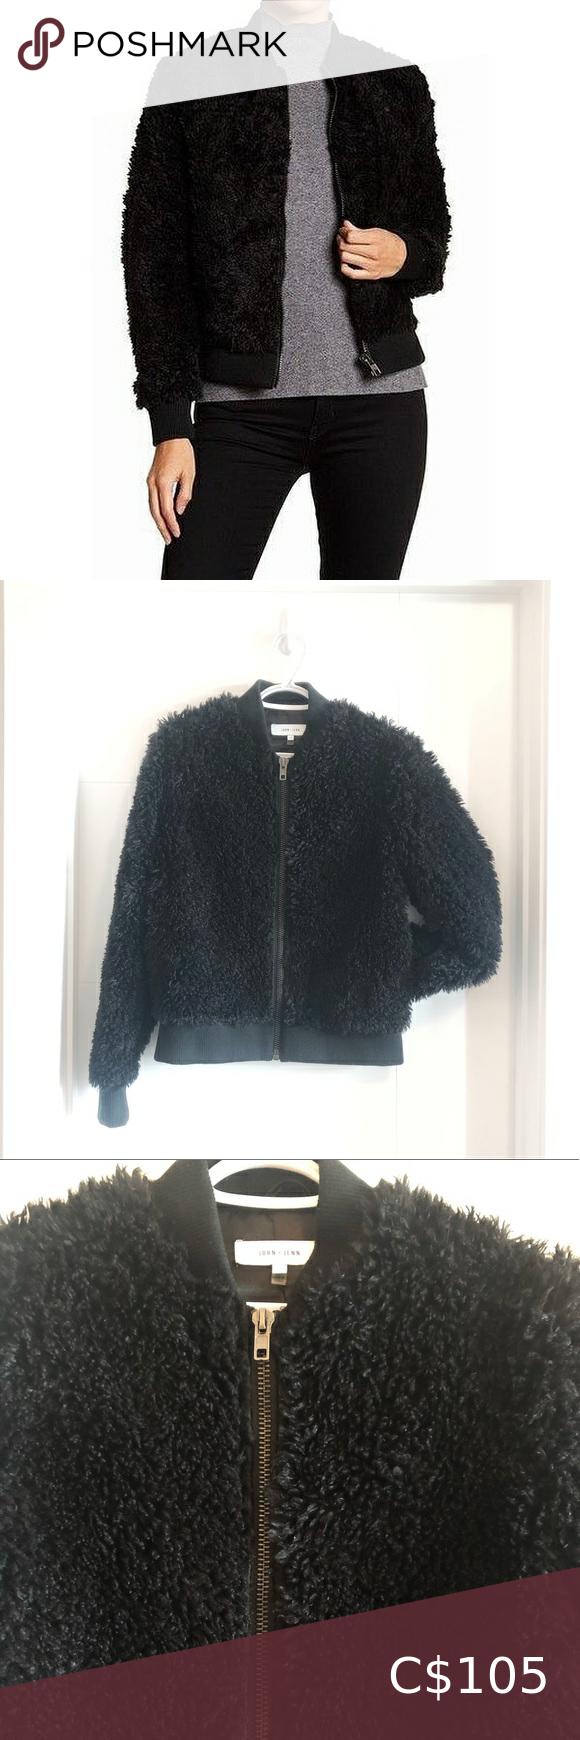 John Jenn Faux Fur Fuzzy Bomber Jacket Super Cute Faux Fur Fuzzy Bomber Jacket From Revolve Brand John Je Pink Short Sleeve Sweater Fashion Fashion Buttons [ 1740 x 580 Pixel ]